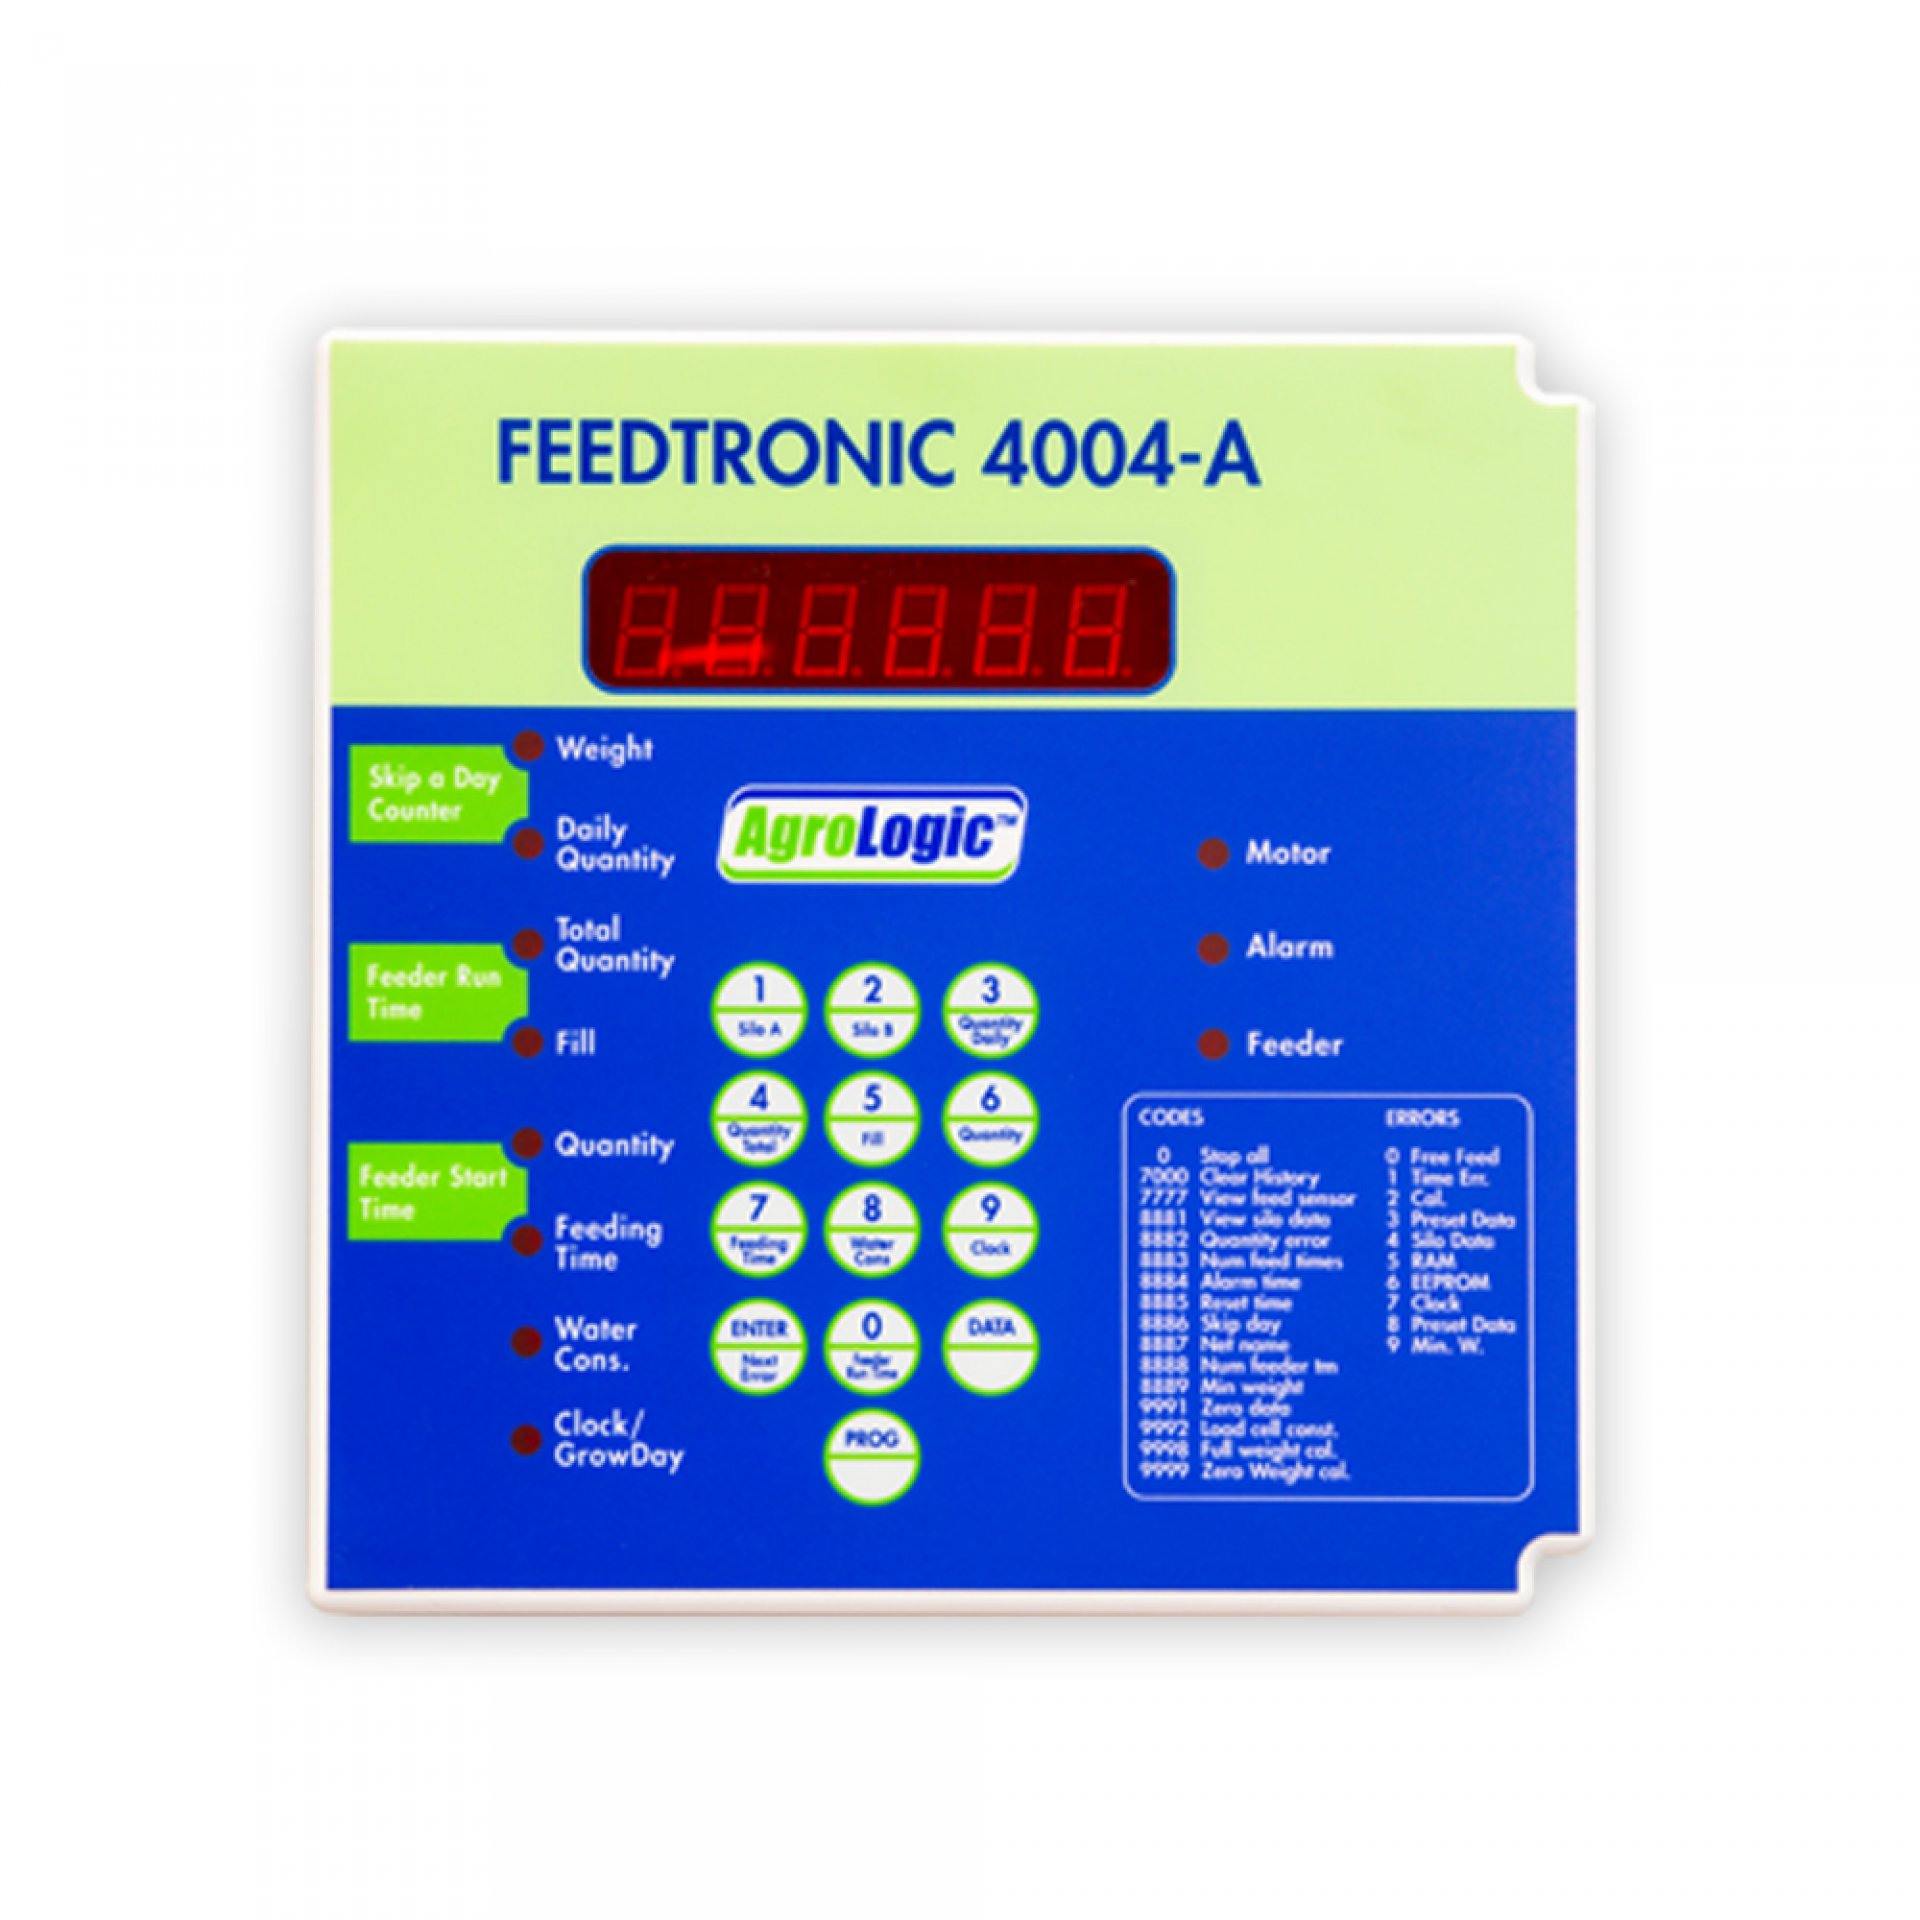 feedtronic-4004-a